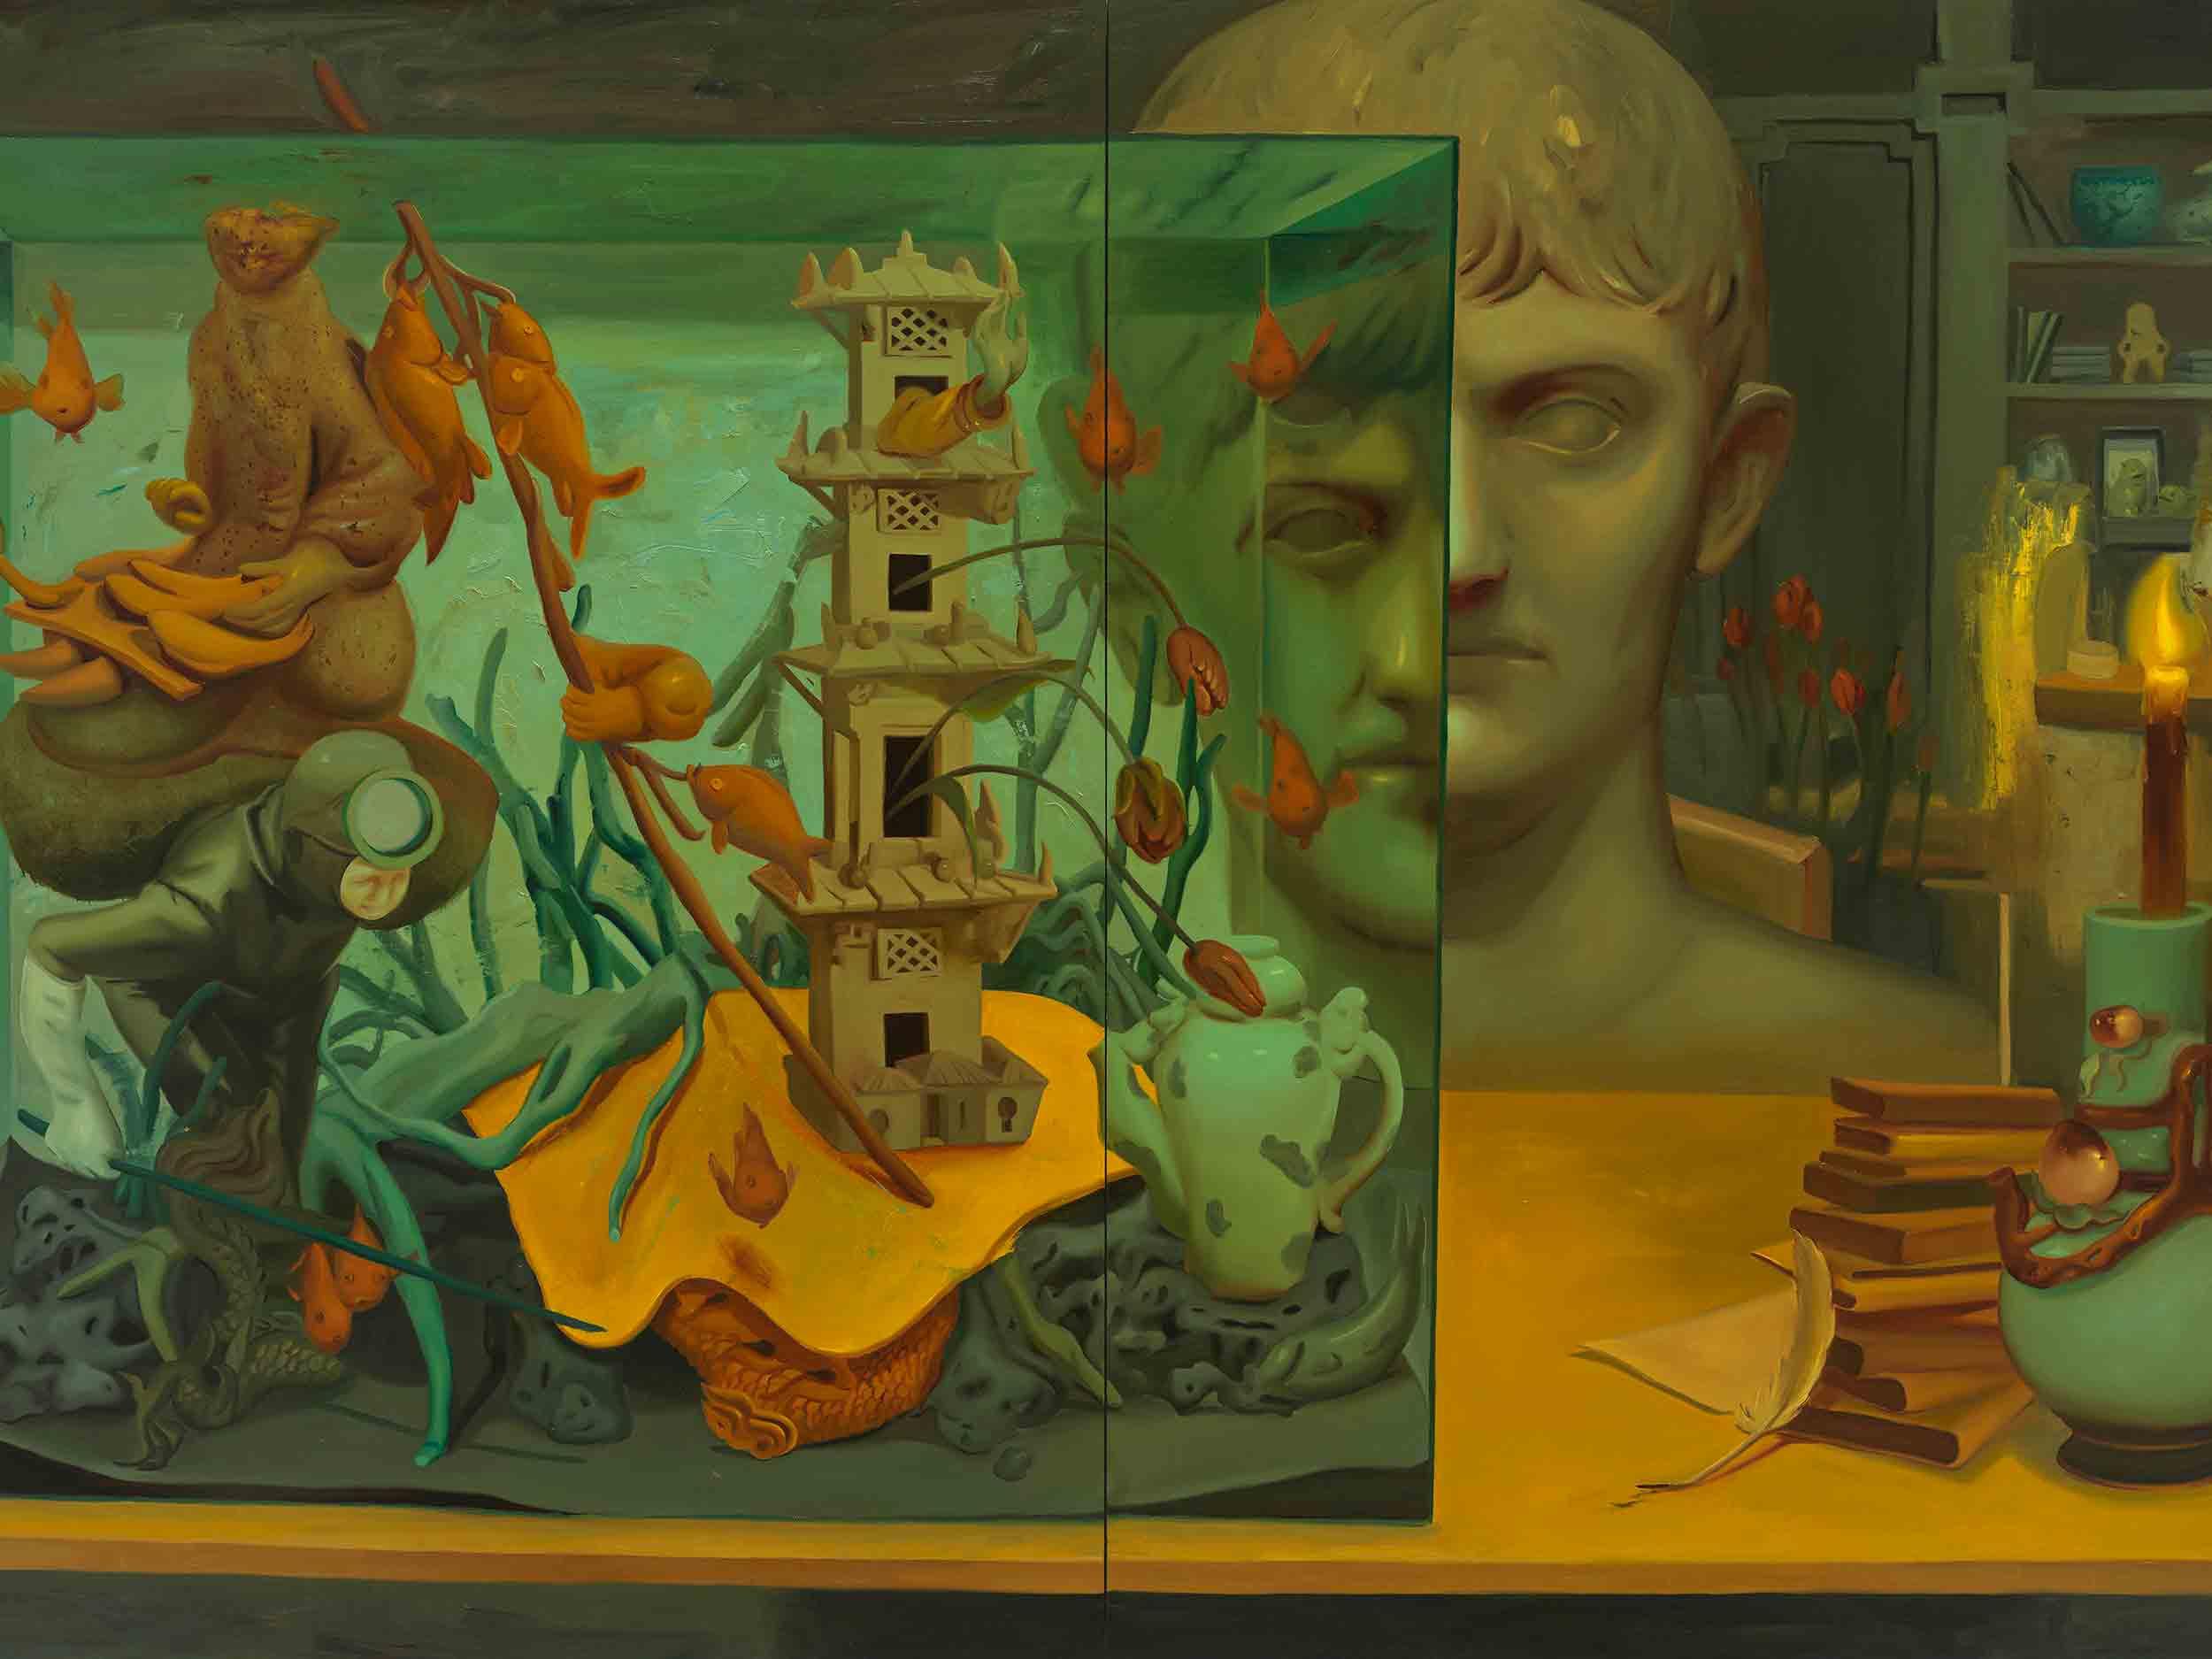 Dominique Fung critiques art history's oriental fantasy